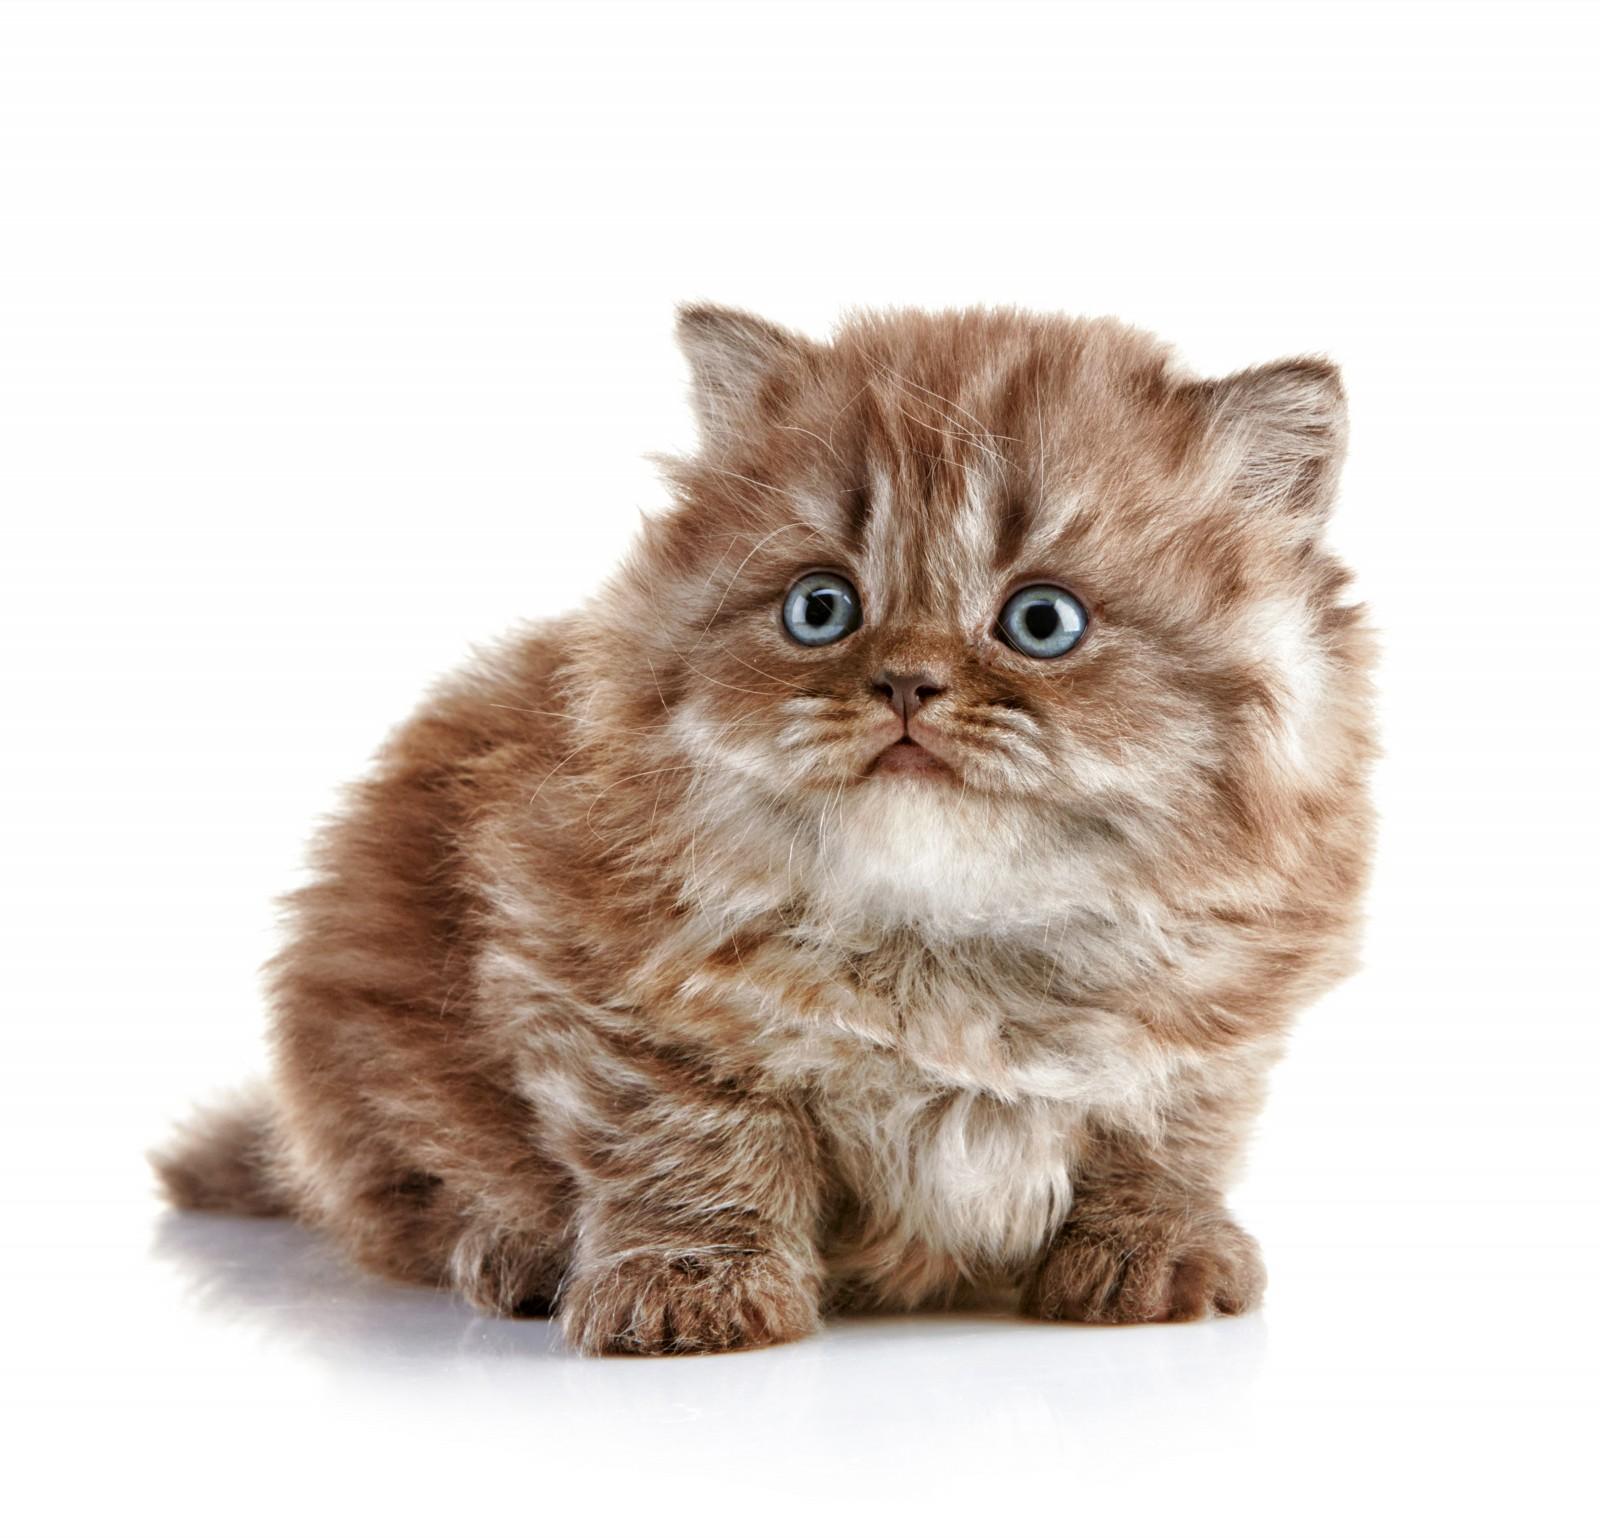 British Longhair Kitten: British Charming British Longhair Kitten Breed